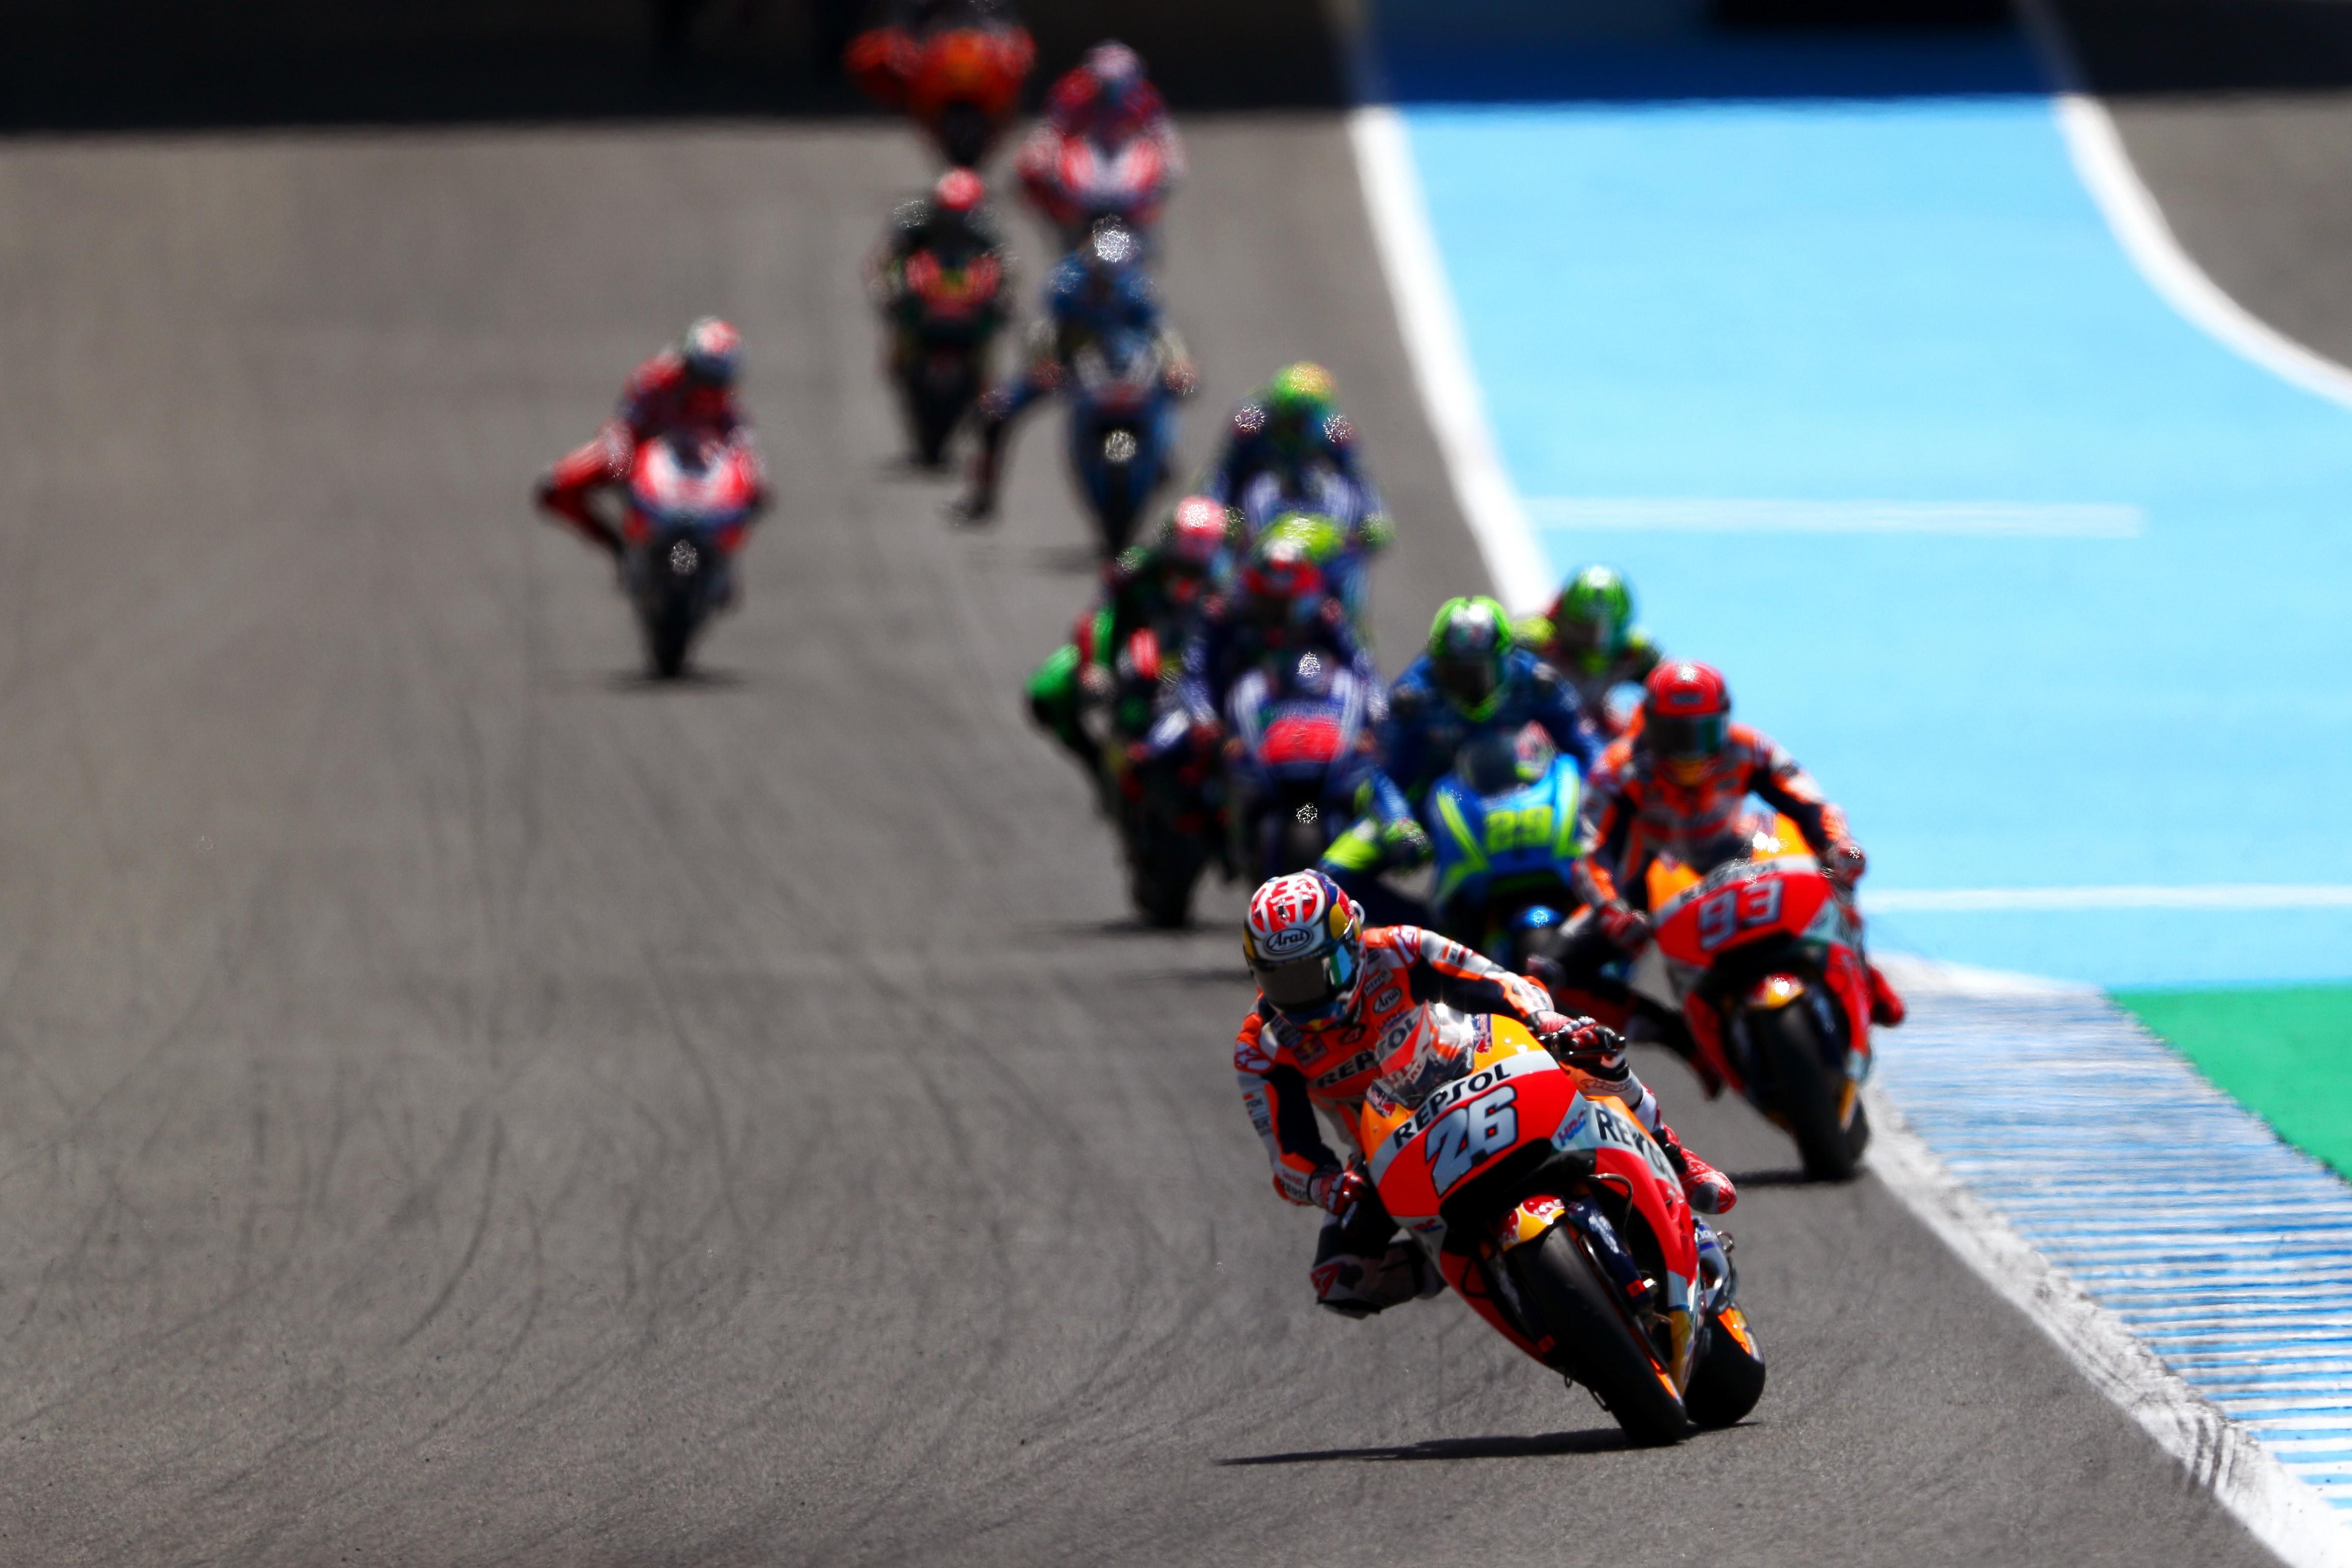 Dani Pedrosa (Honda HRC) au Grand Prix d'Espagne 2017